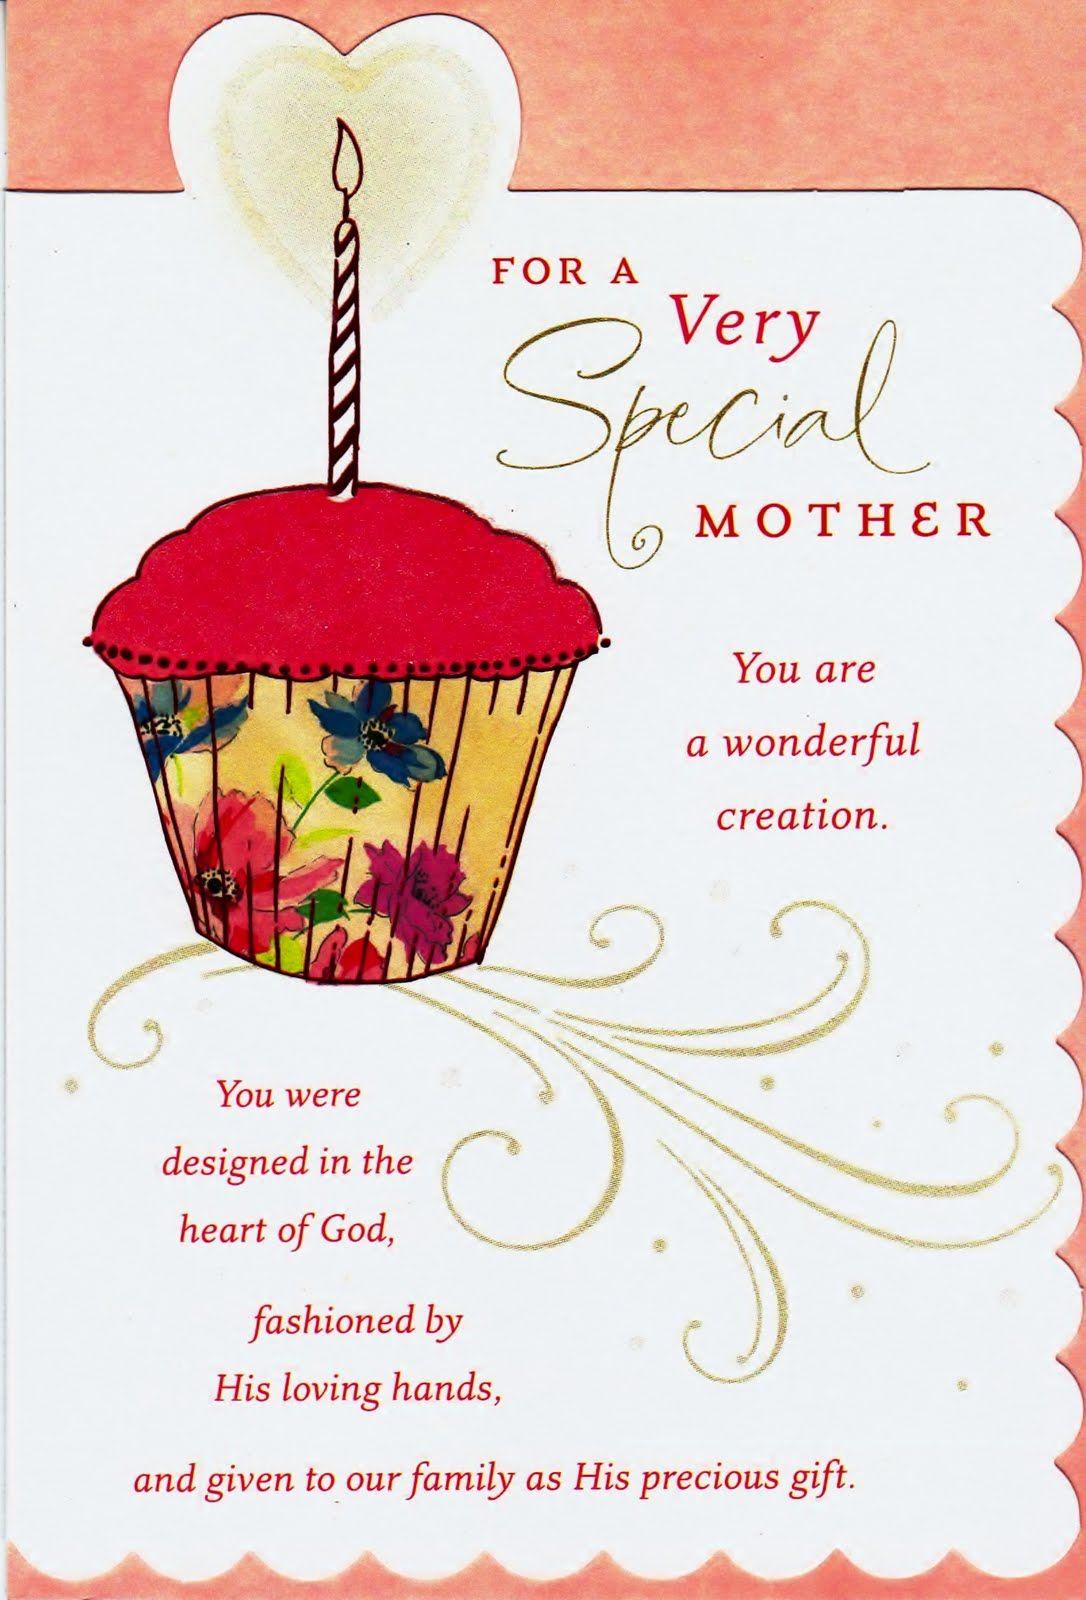 happy birthday mom Free Large Images Mom birthday